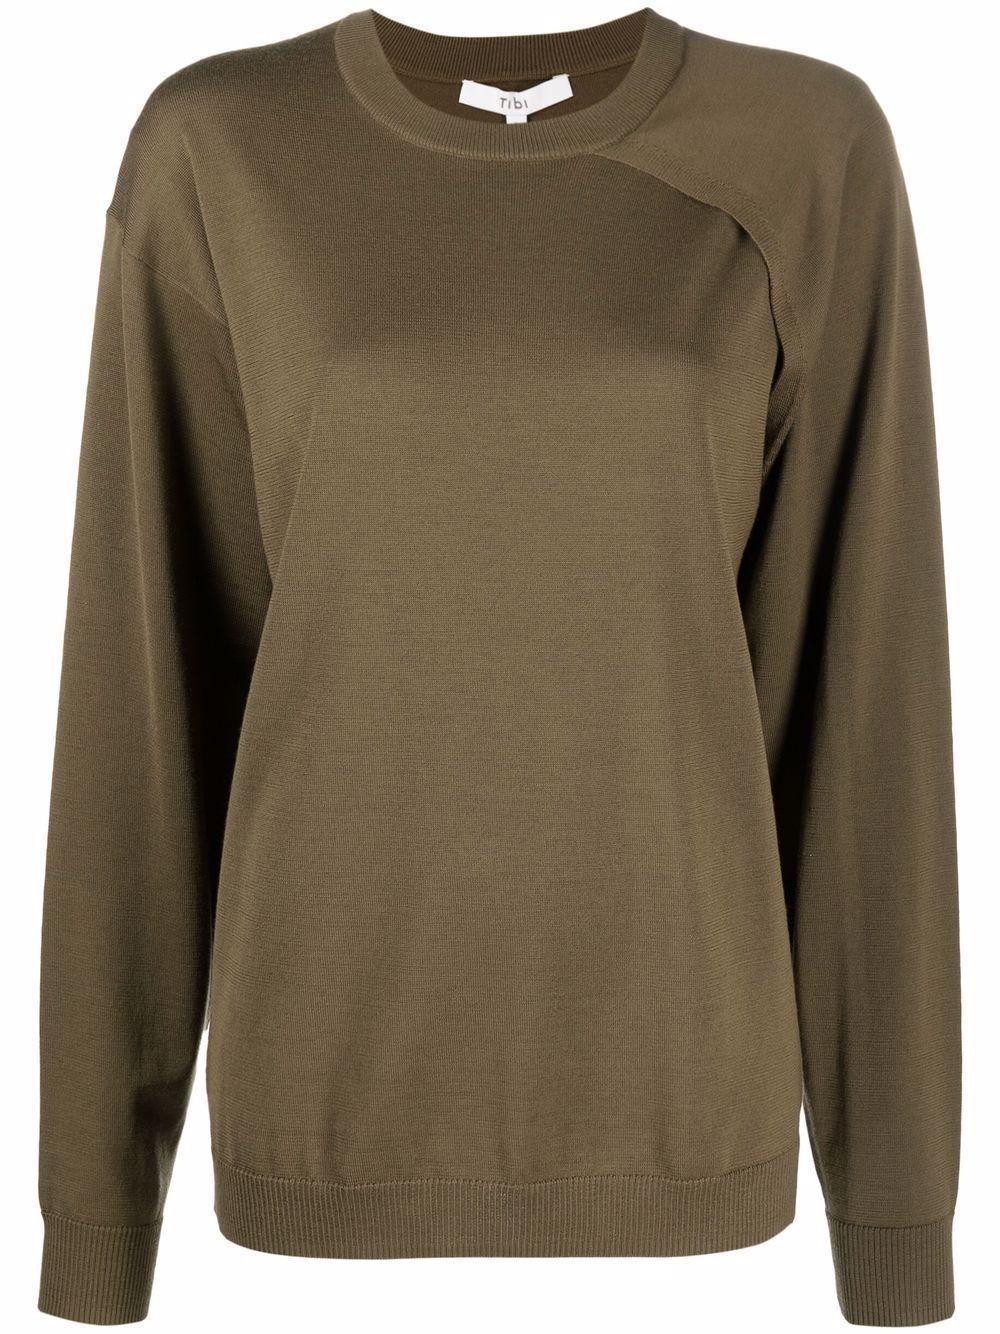 Mele Merino Wool Asymmetrical Sleeve Sweater Item # F121MW6347